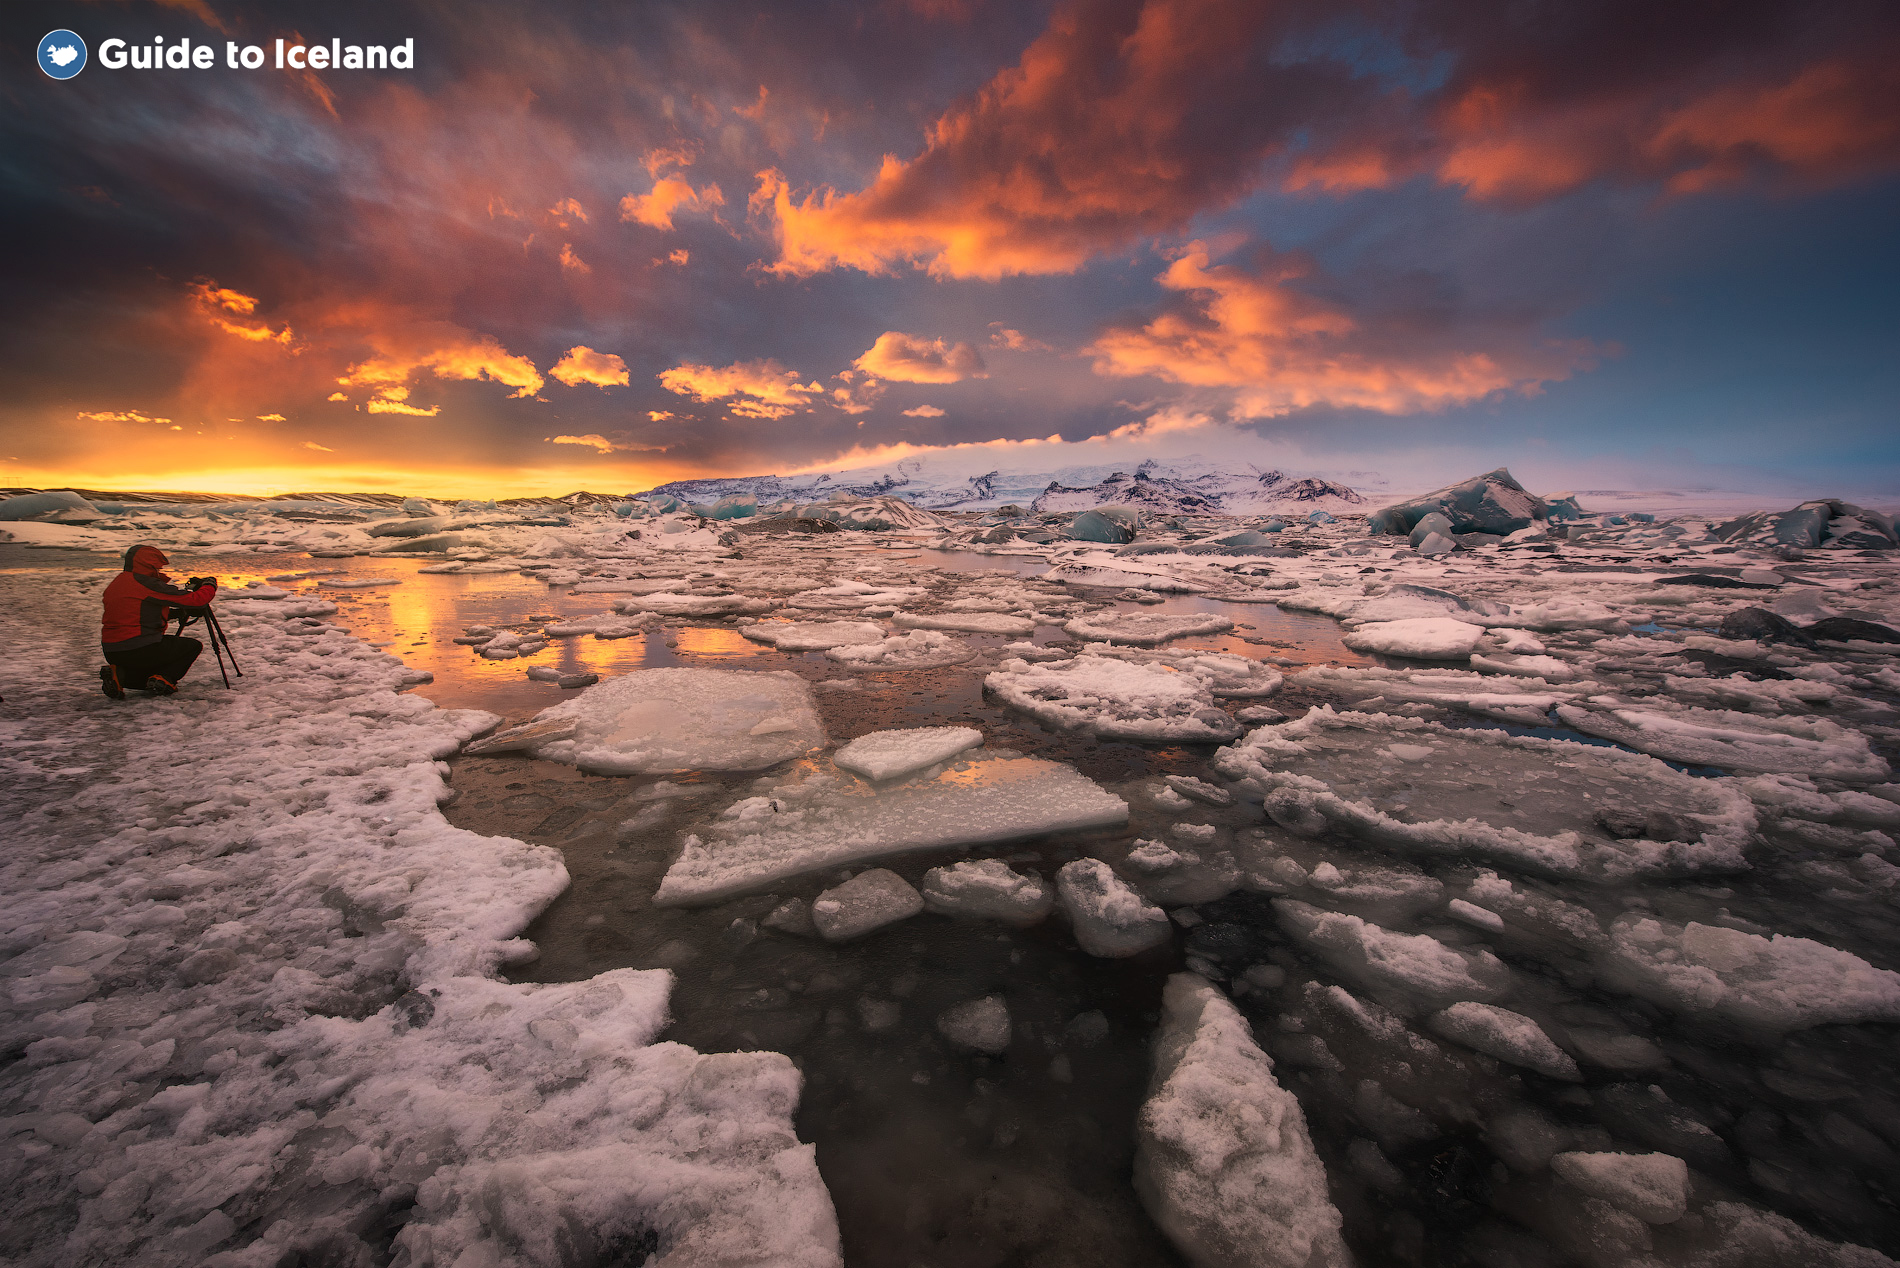 Jökulsárlón glacier lagoon painted in pink colours from the midnight sun.